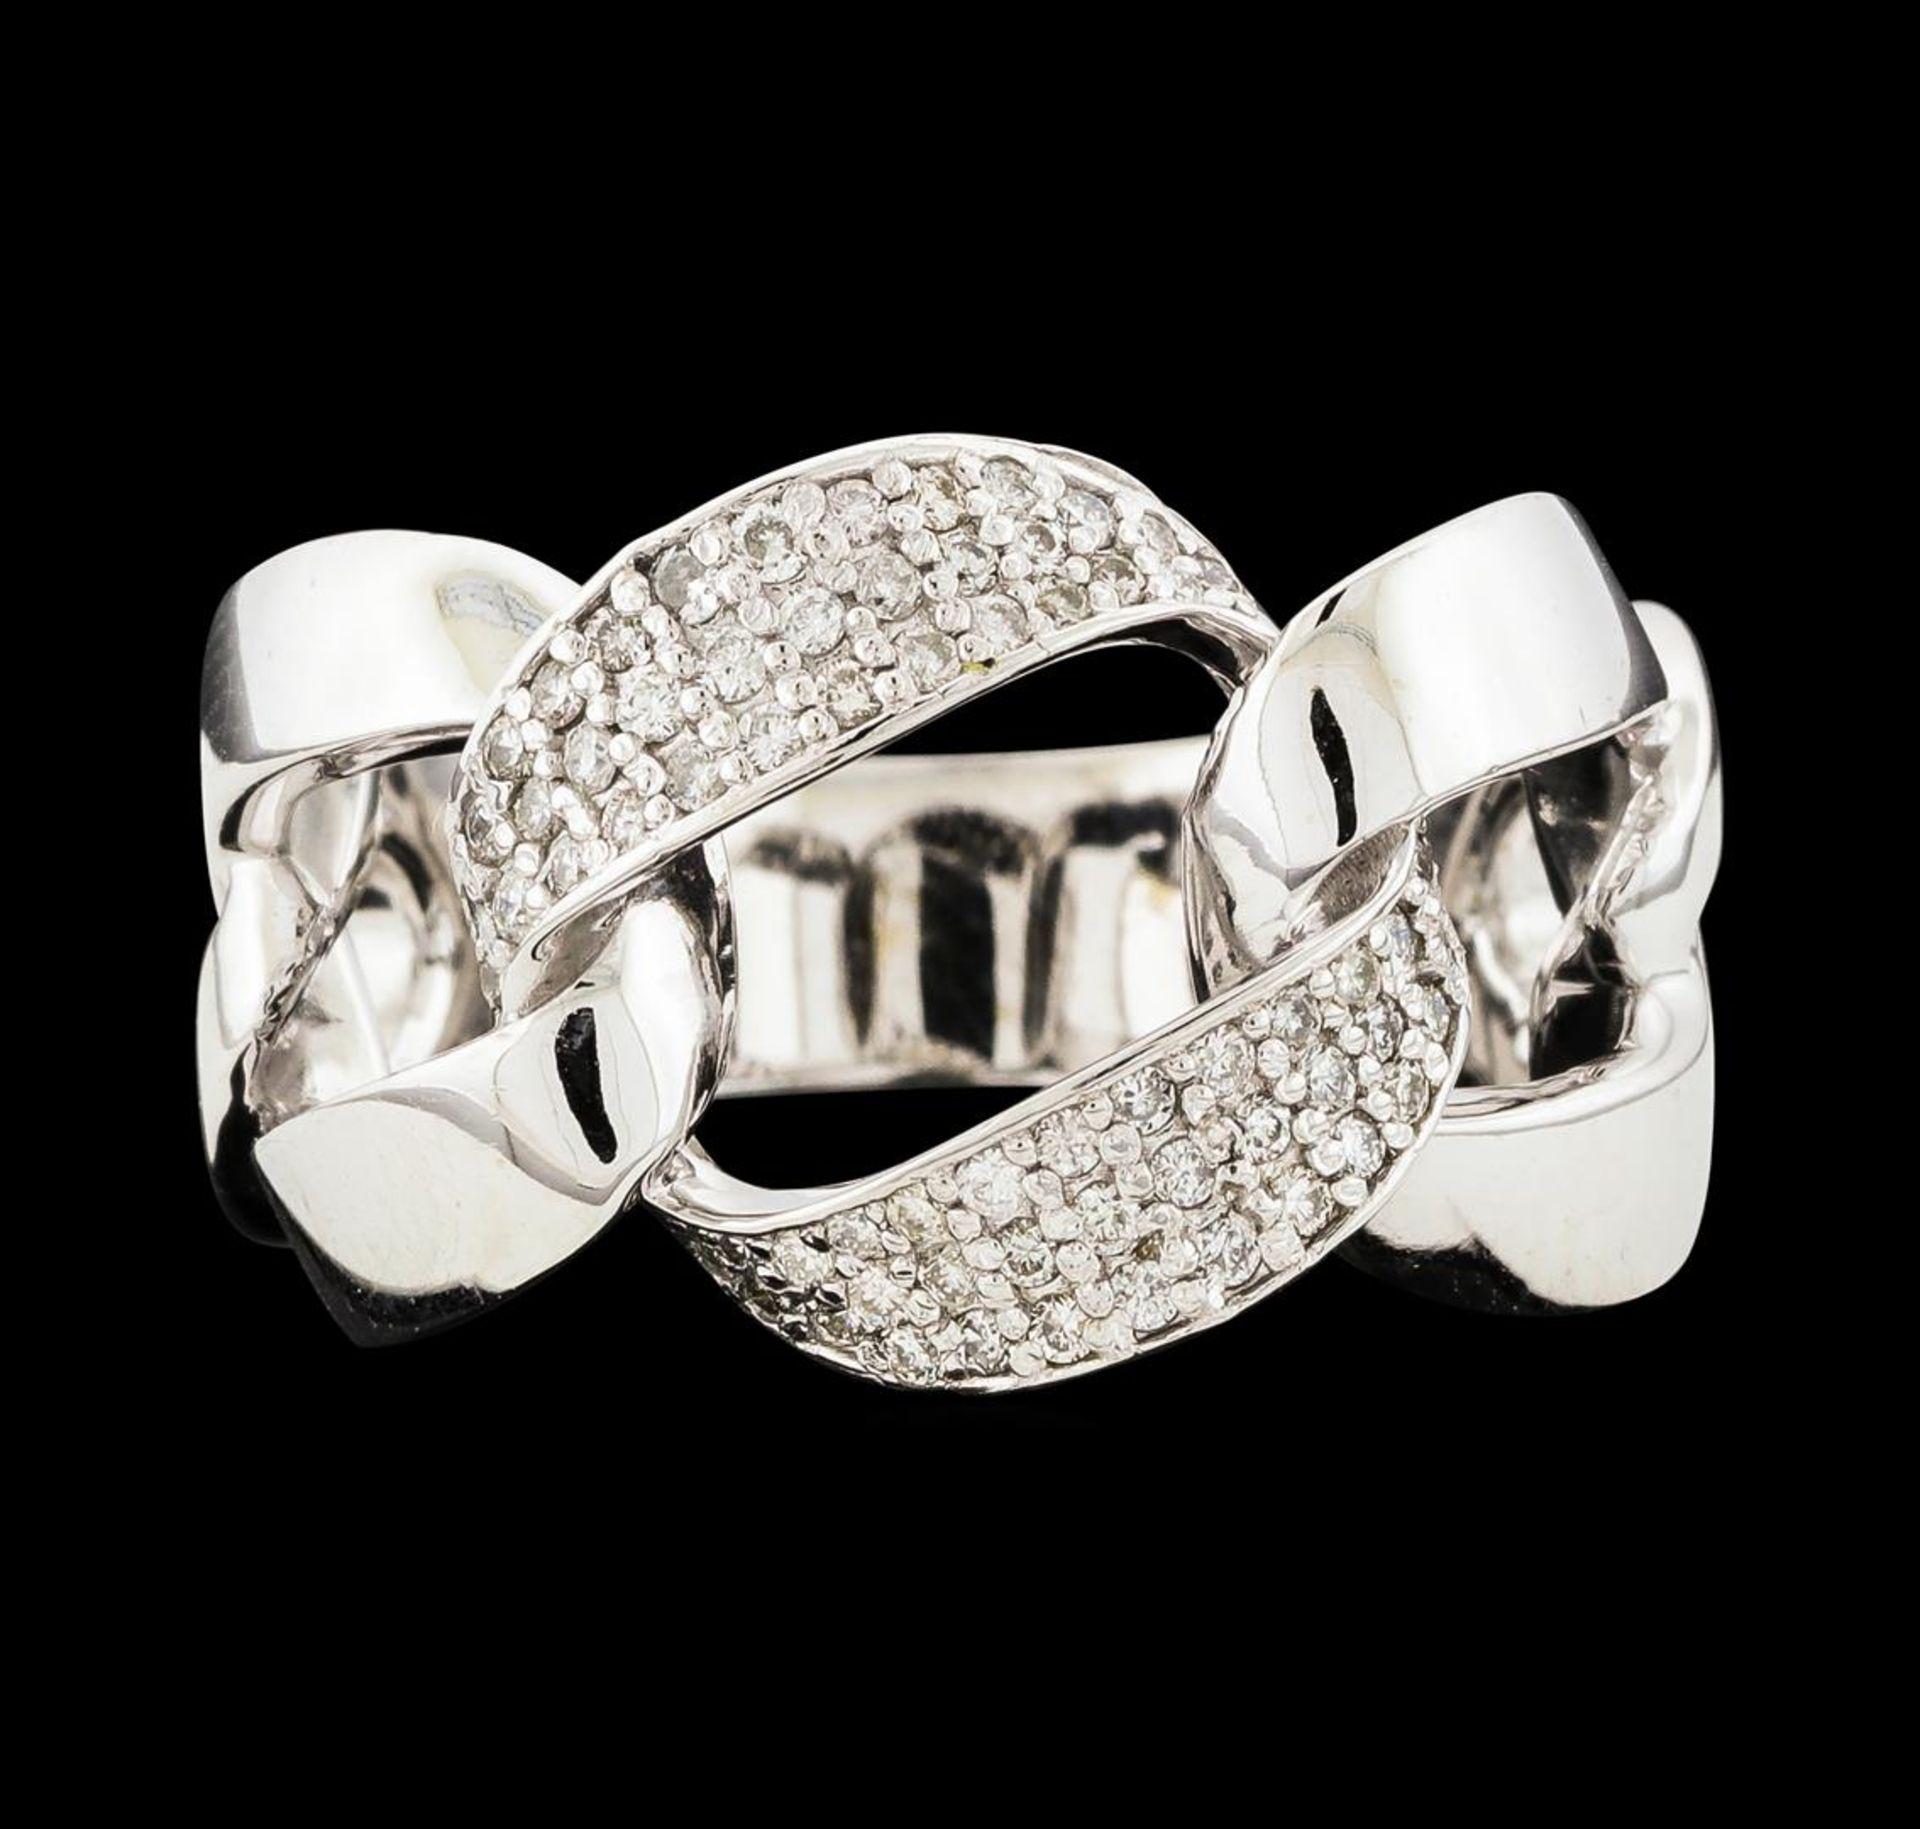 0.33 ctw Diamond Ring - 14KT White Gold - Image 2 of 4